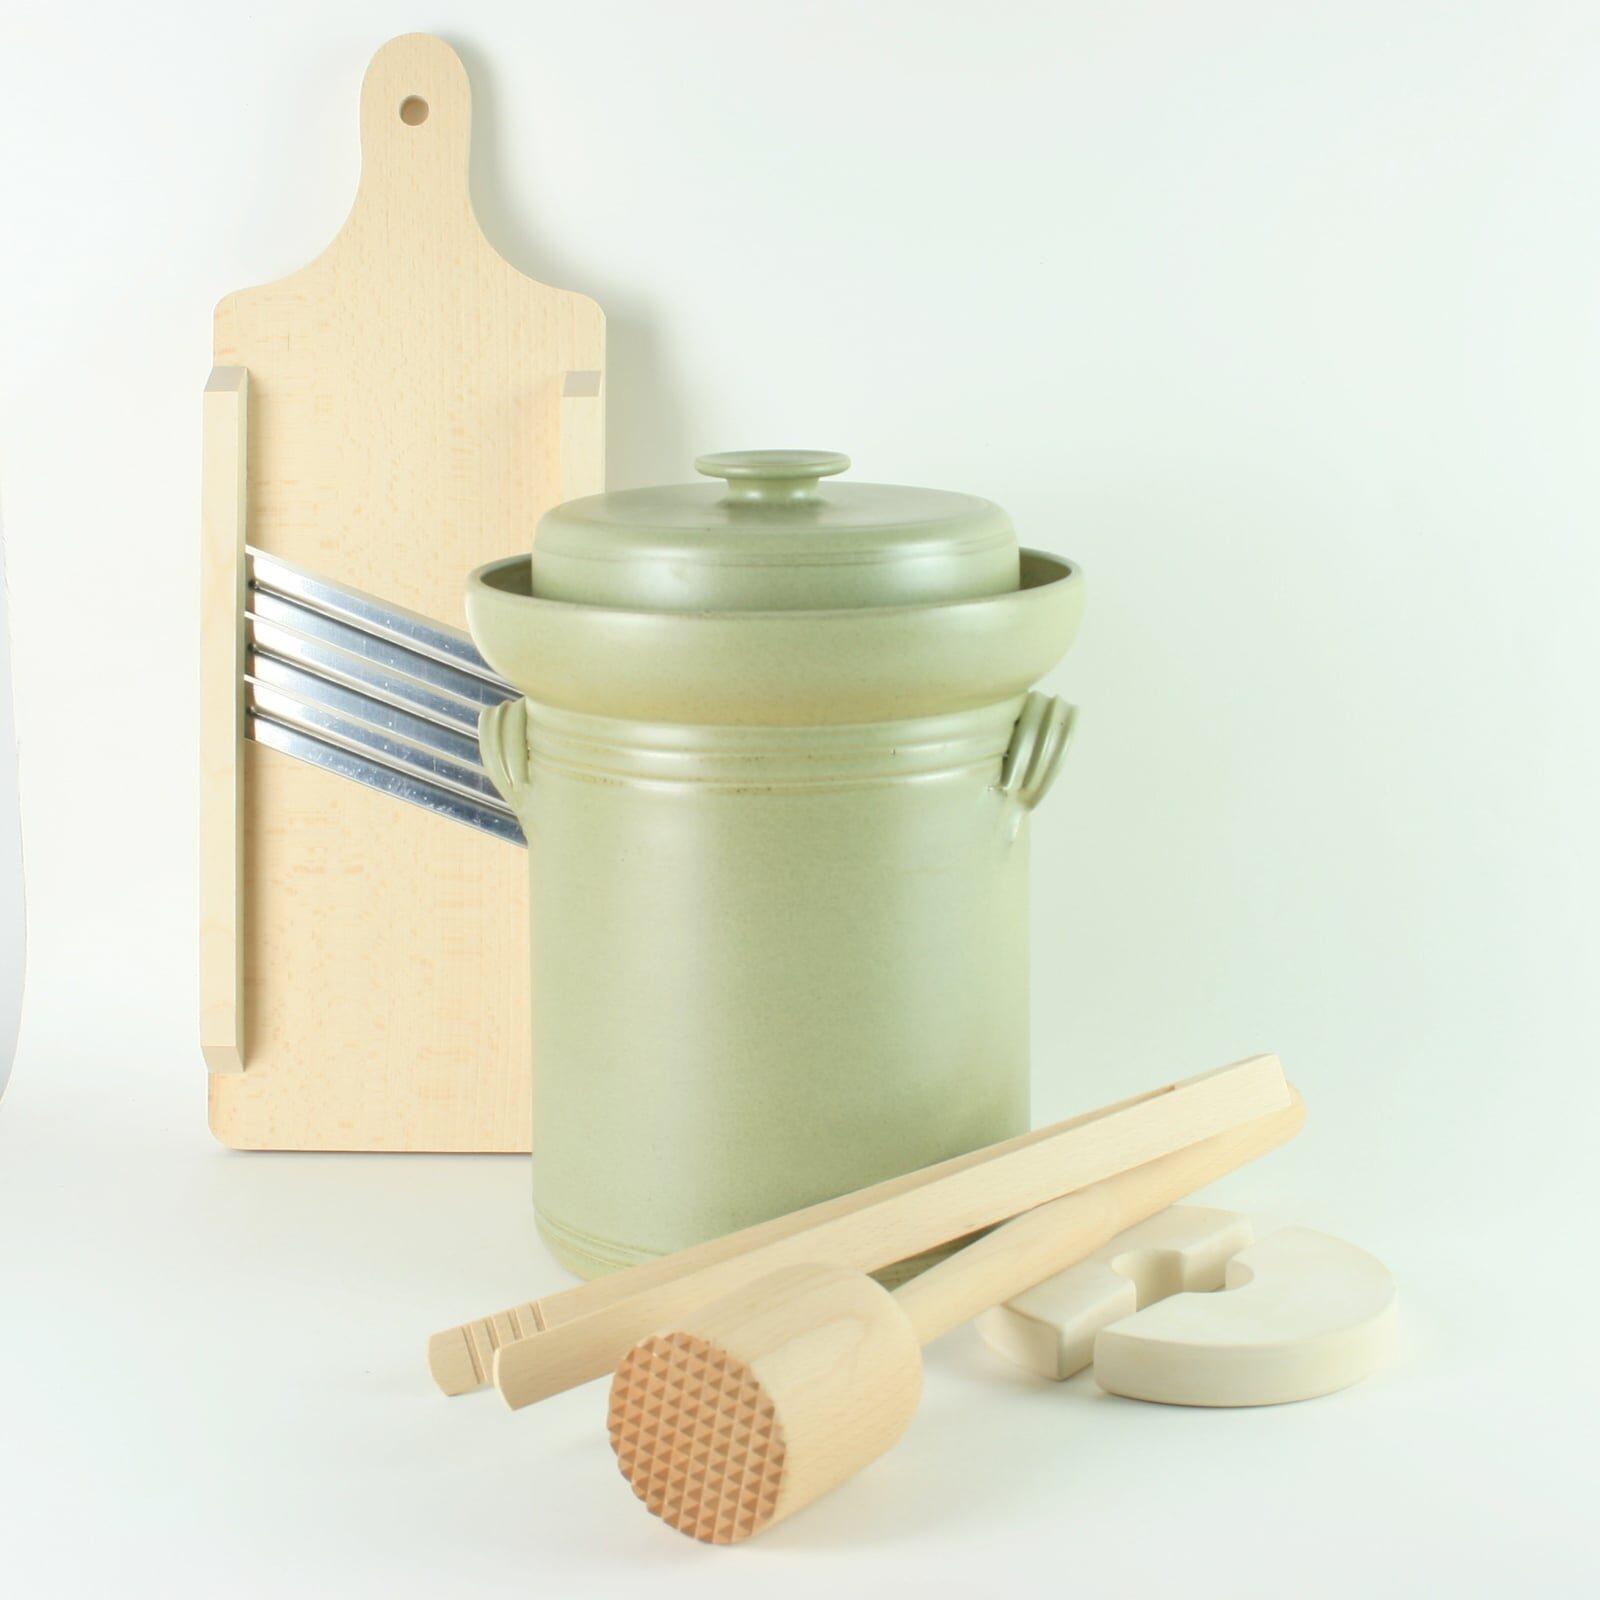 handmade 4 litre ceramic fermentation crock set for making sauerkraut, kimchi and pickles with wooden tools